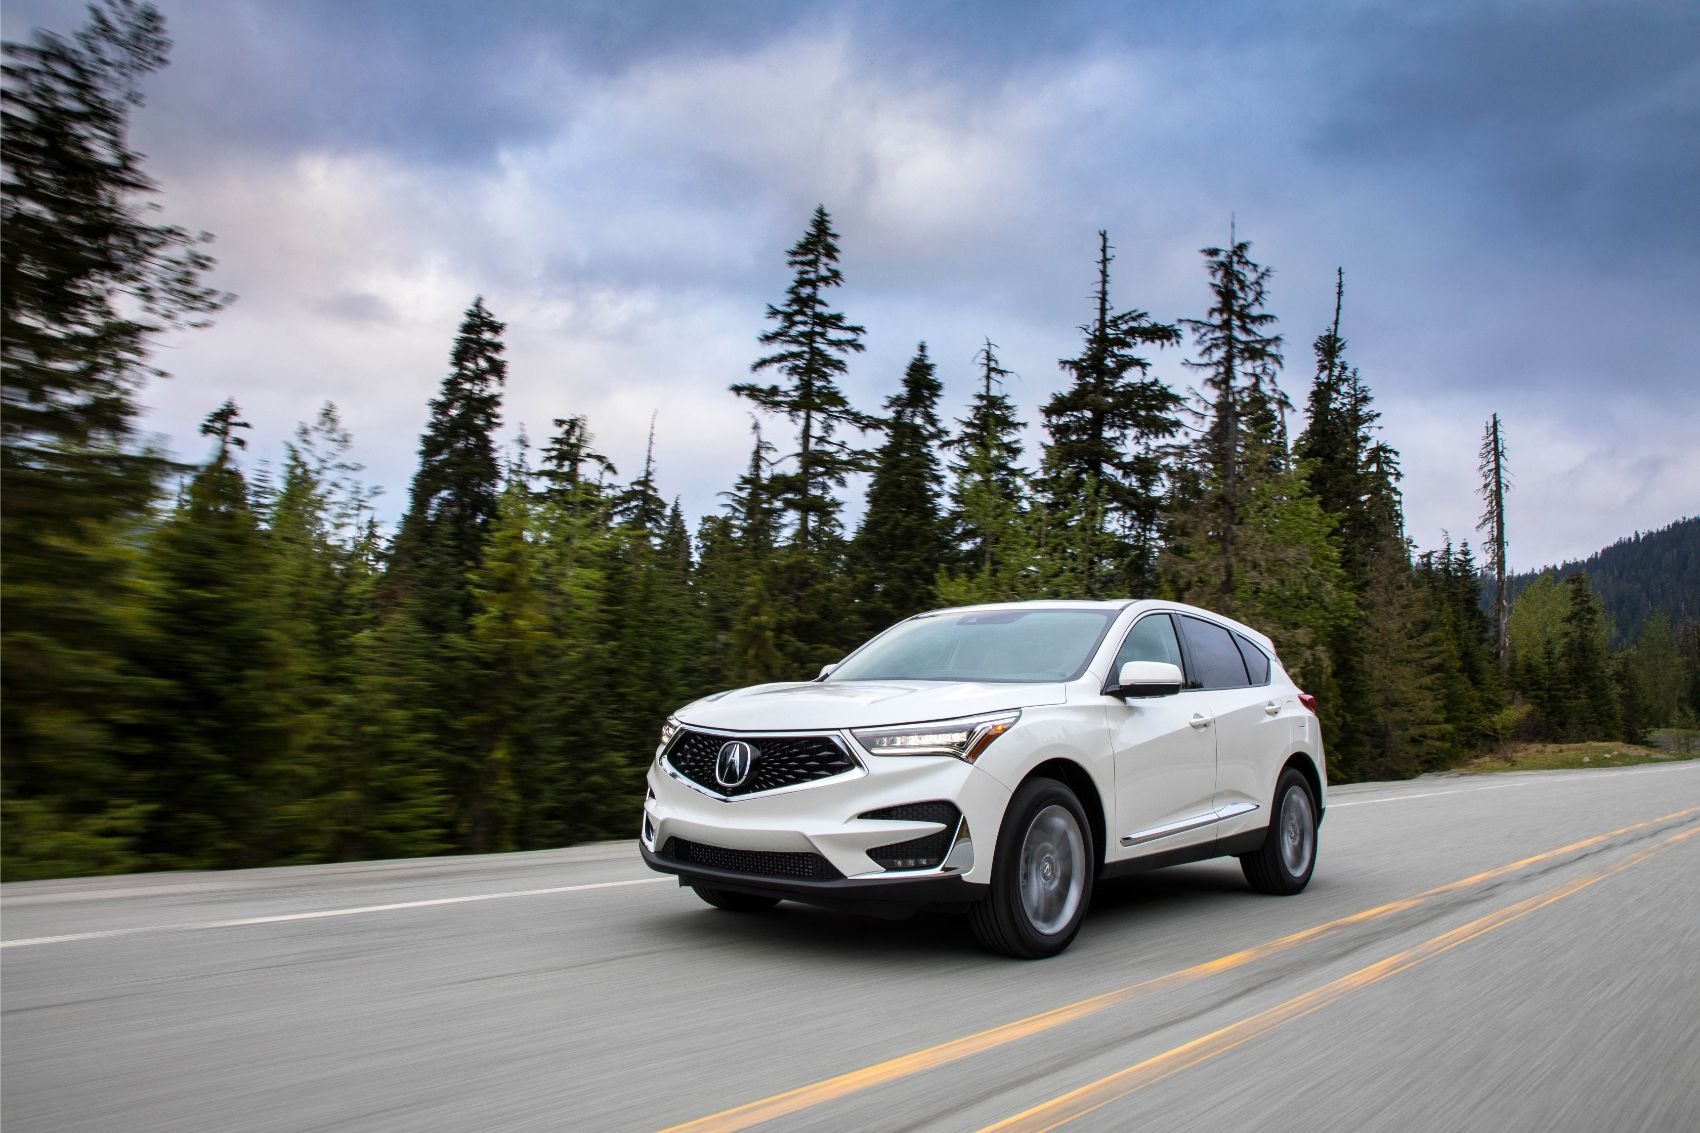 Honda Electric Car >> 2020 Acura RDX Hits Dealerships: A Brief Walk Around